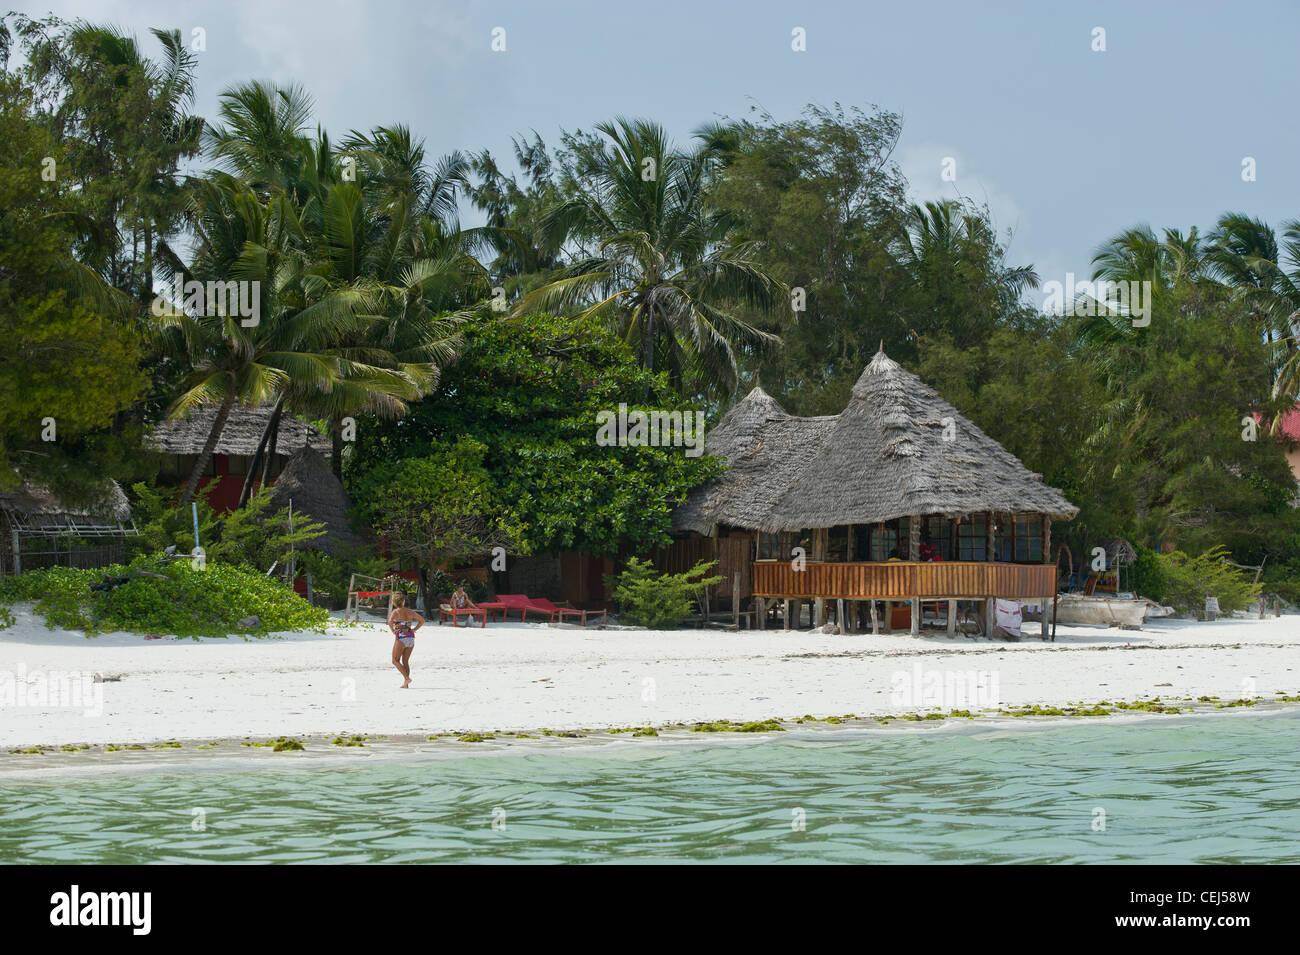 Restaurant on the beach in Bwejuu Zanzibar Tanzania Stock Photo